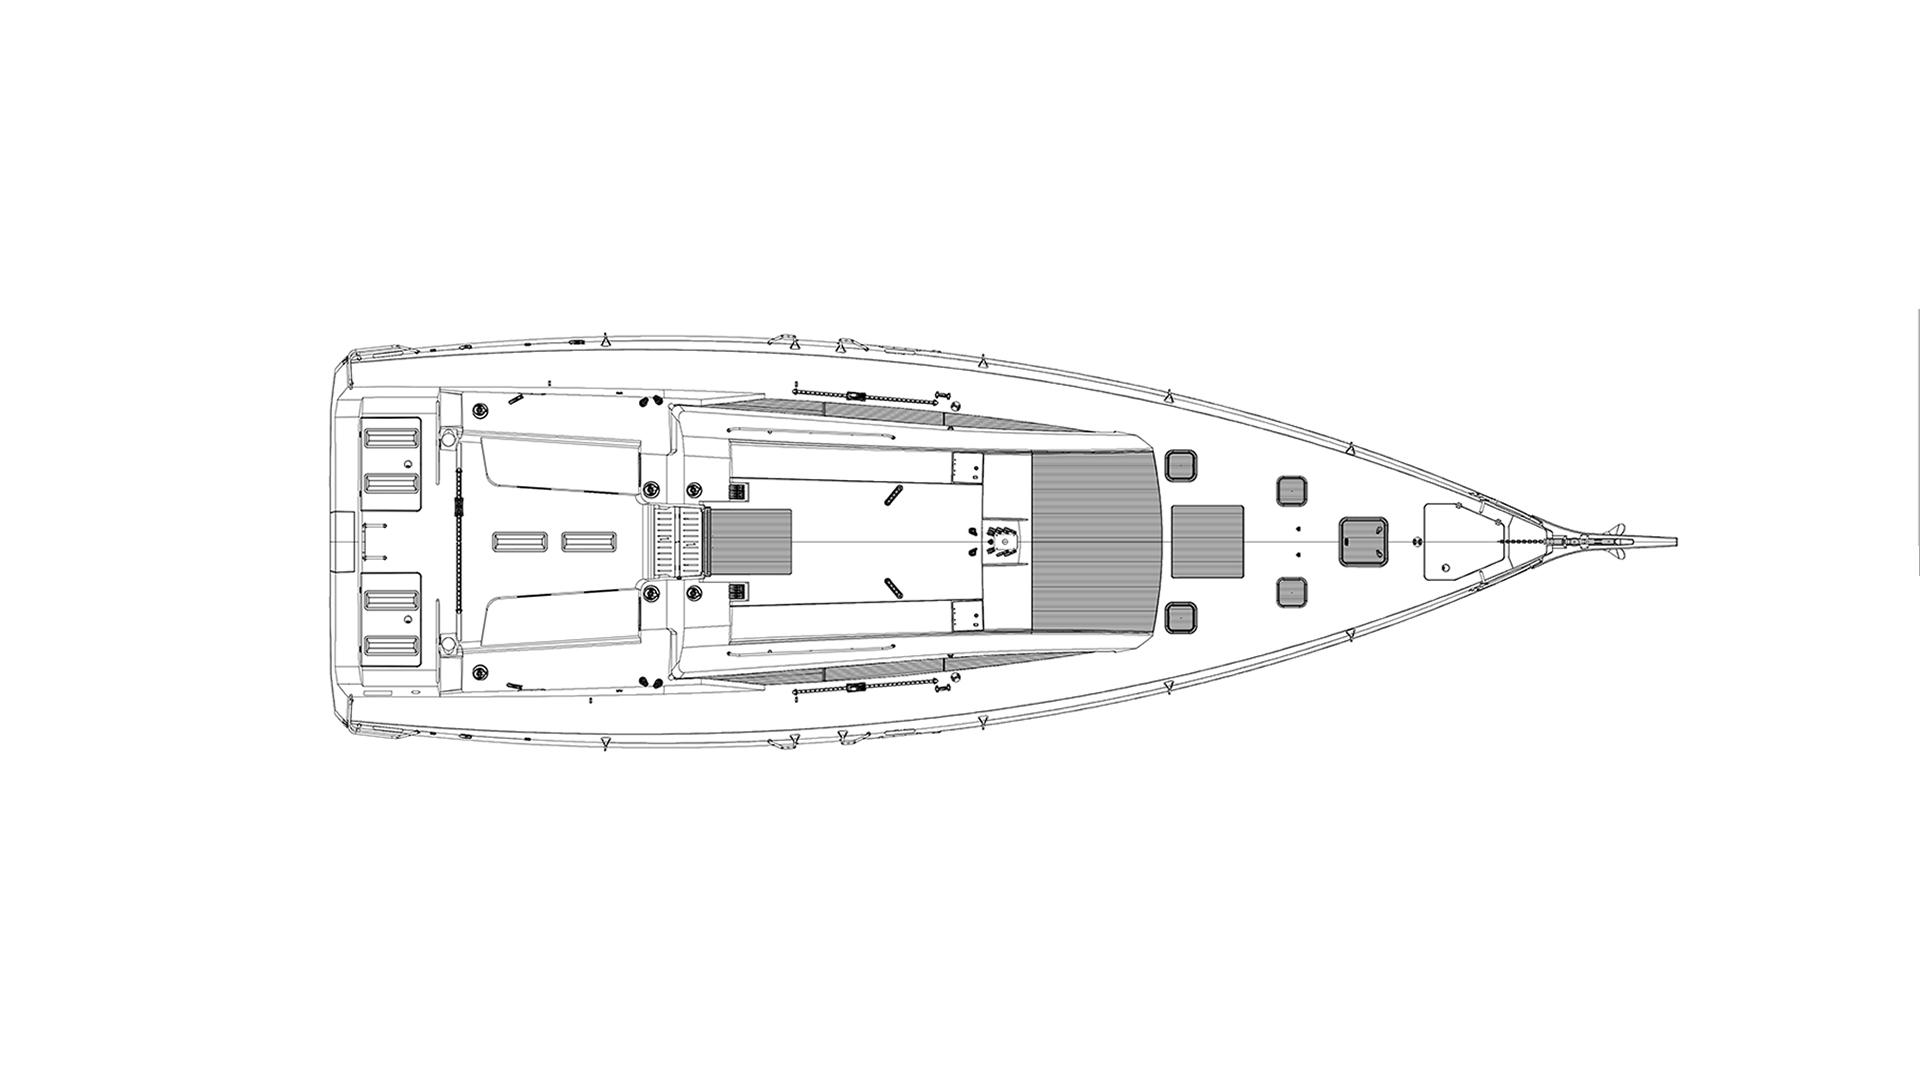 RM 1370